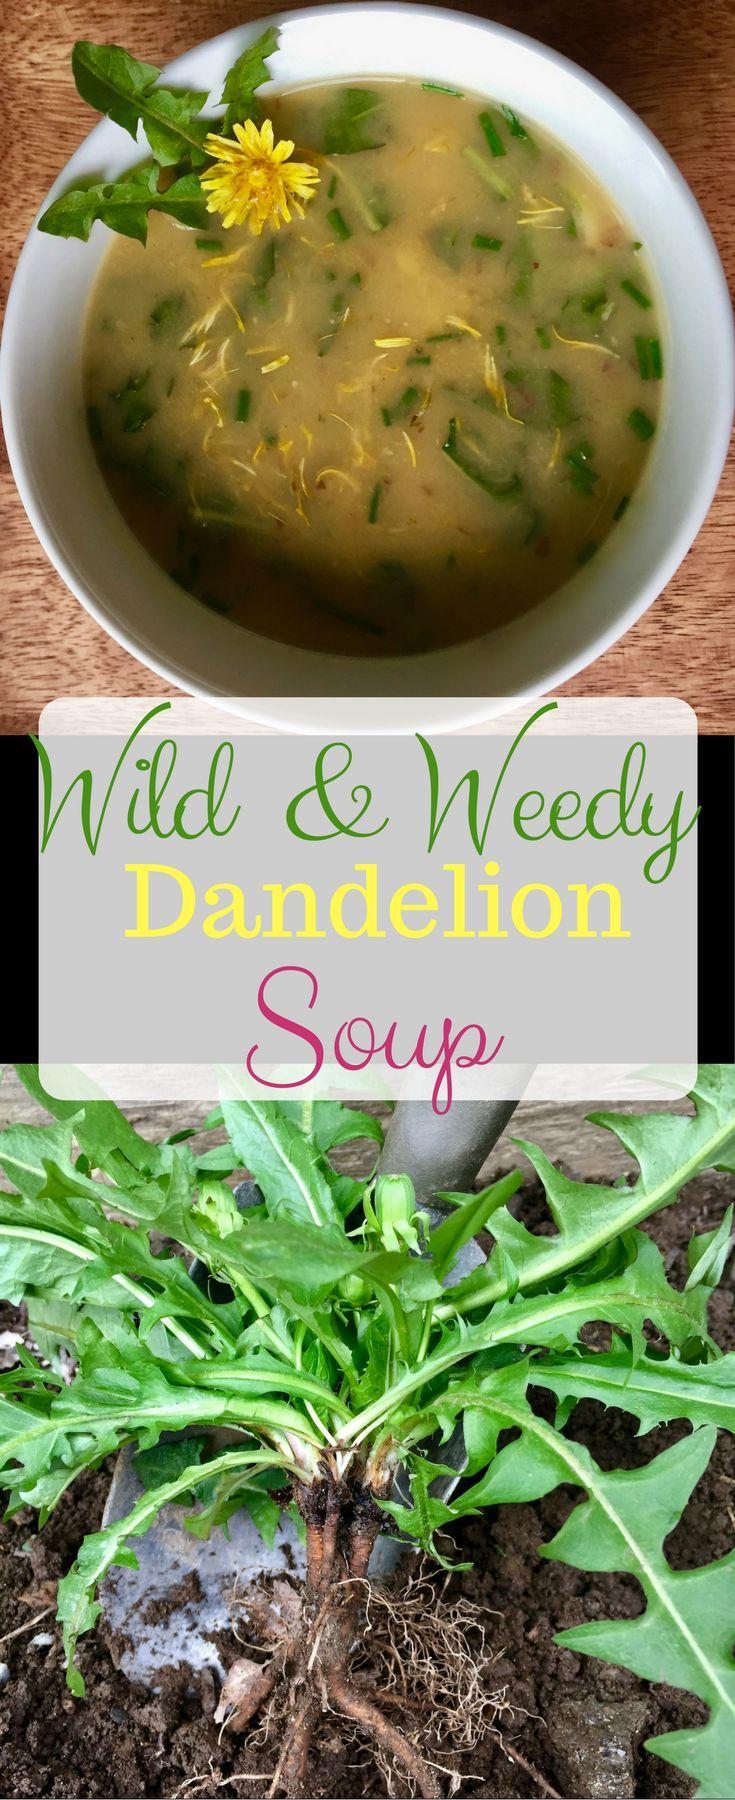 Wild & Weedy Dandelion Soup